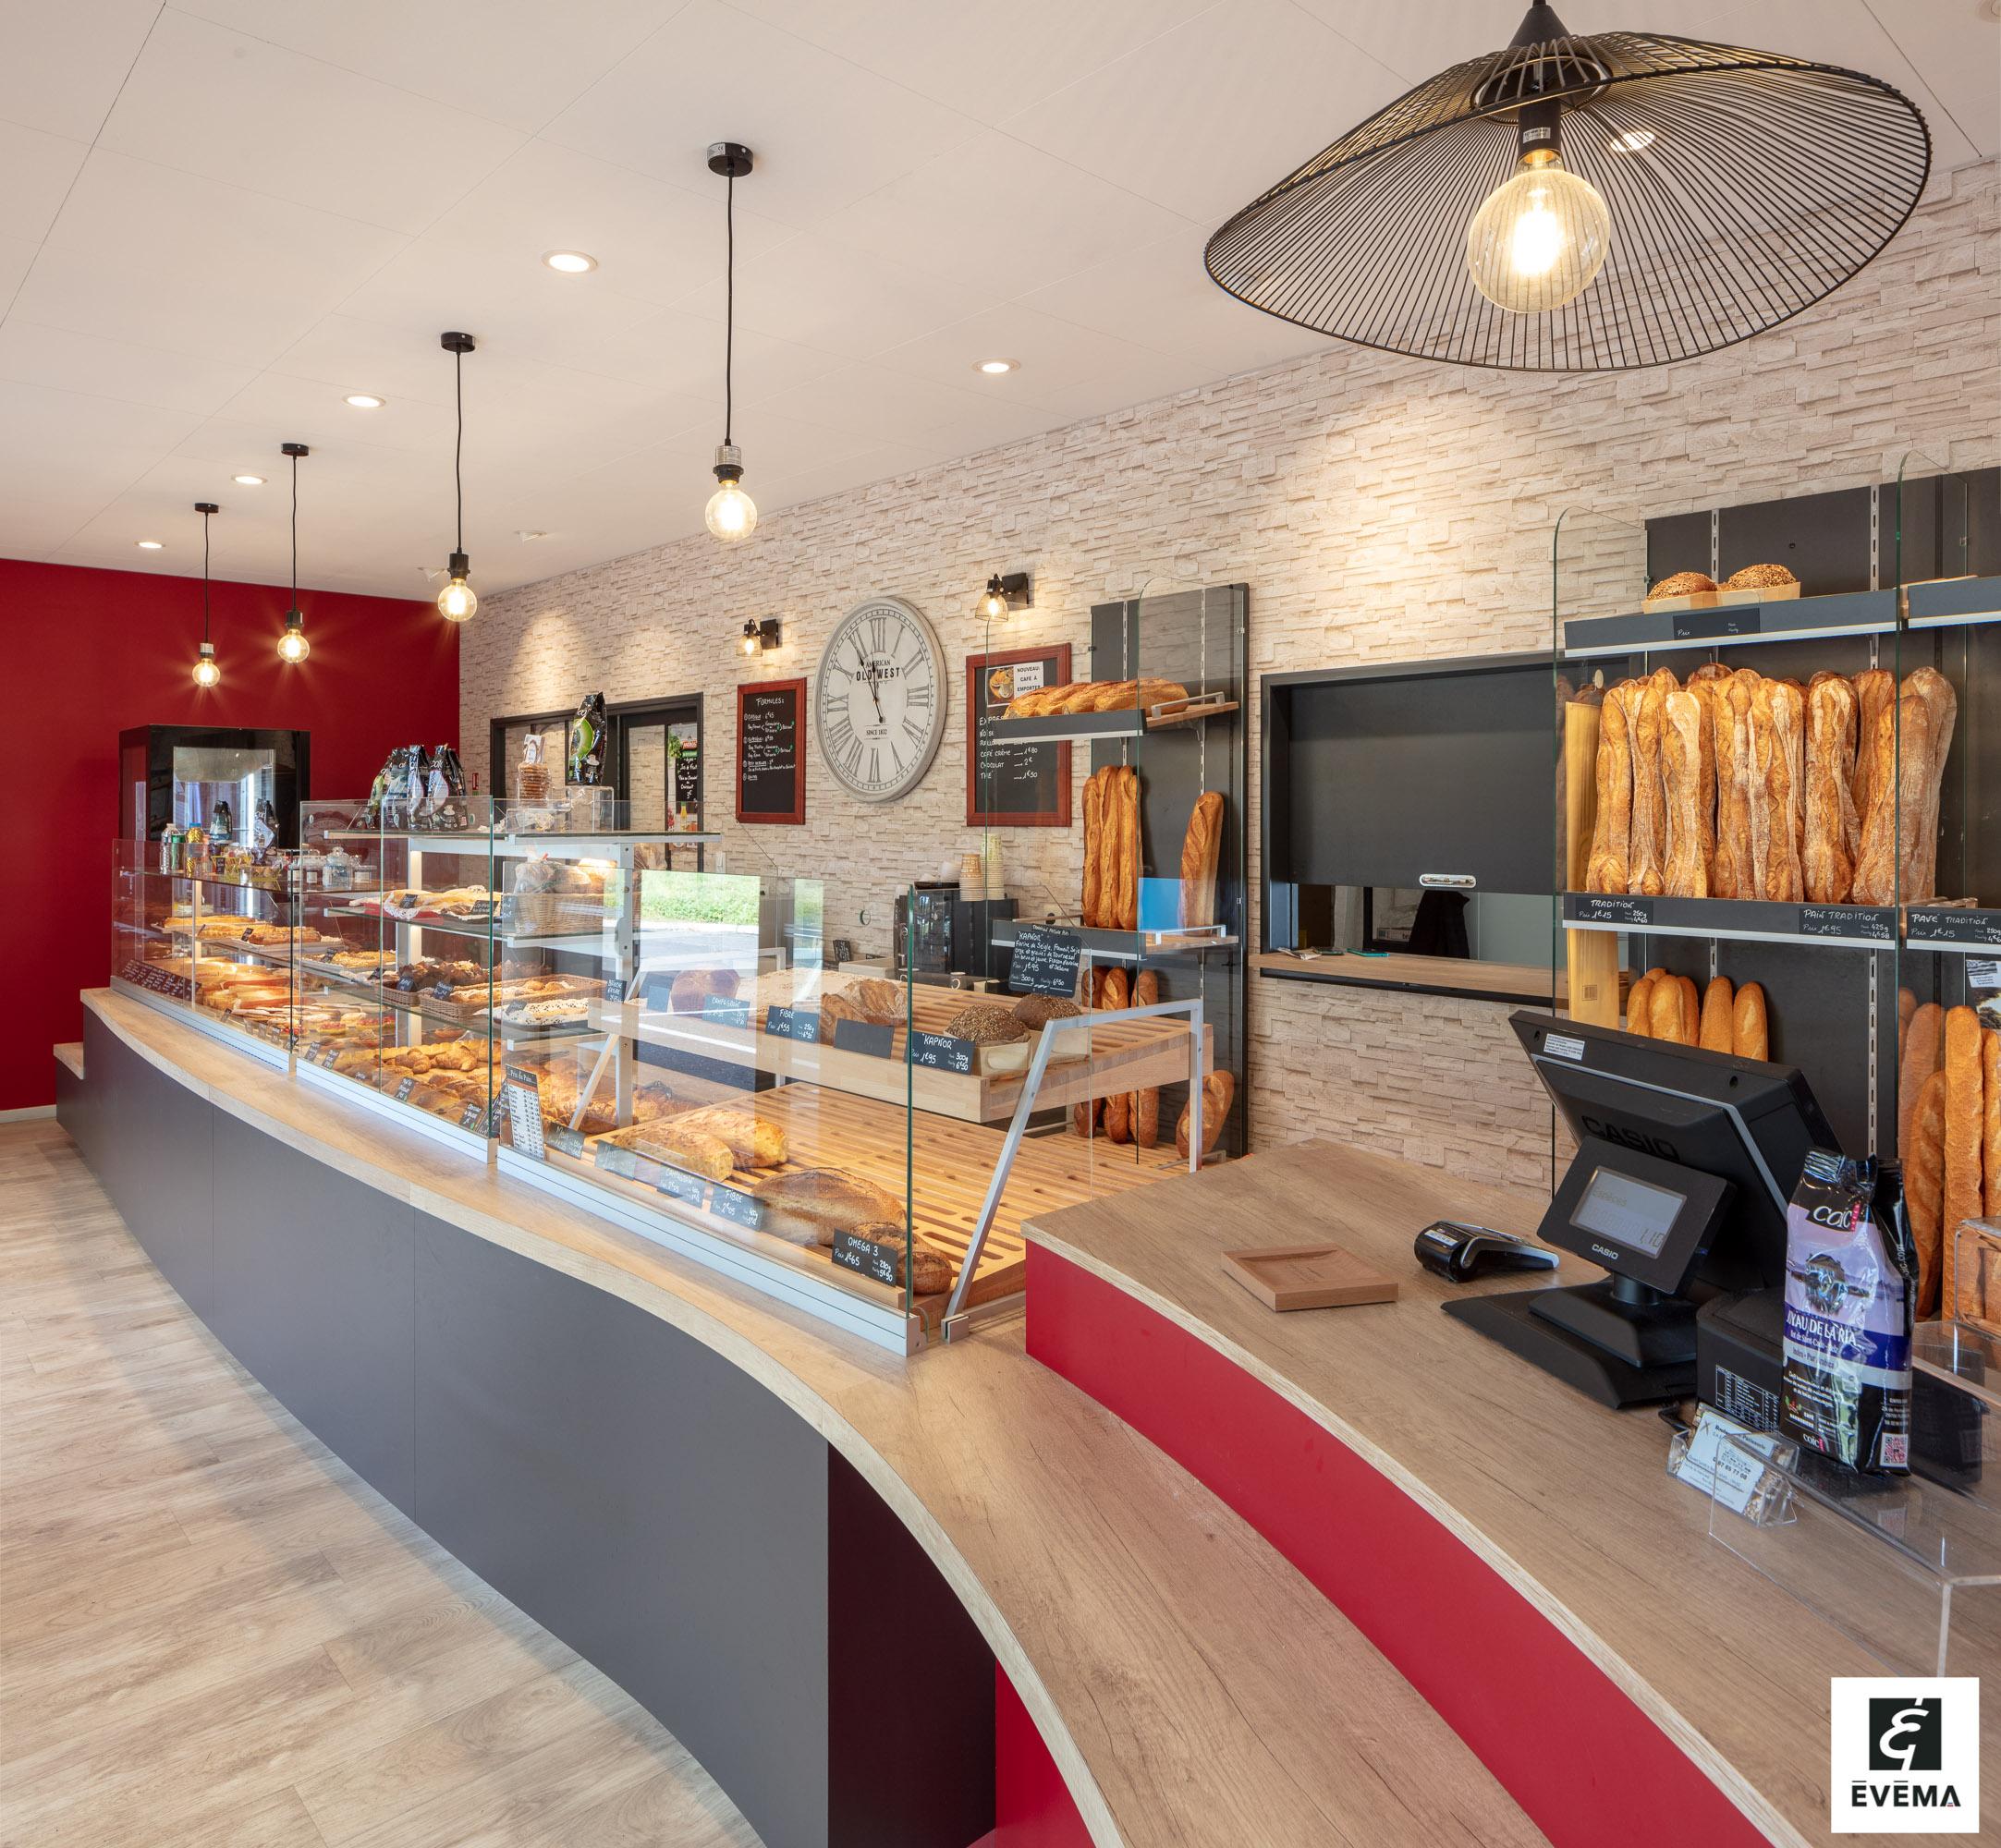 Réalisations vitrines Boulangerie – Pâtisserie / Vitrine boulangerie - O rond pain / 11